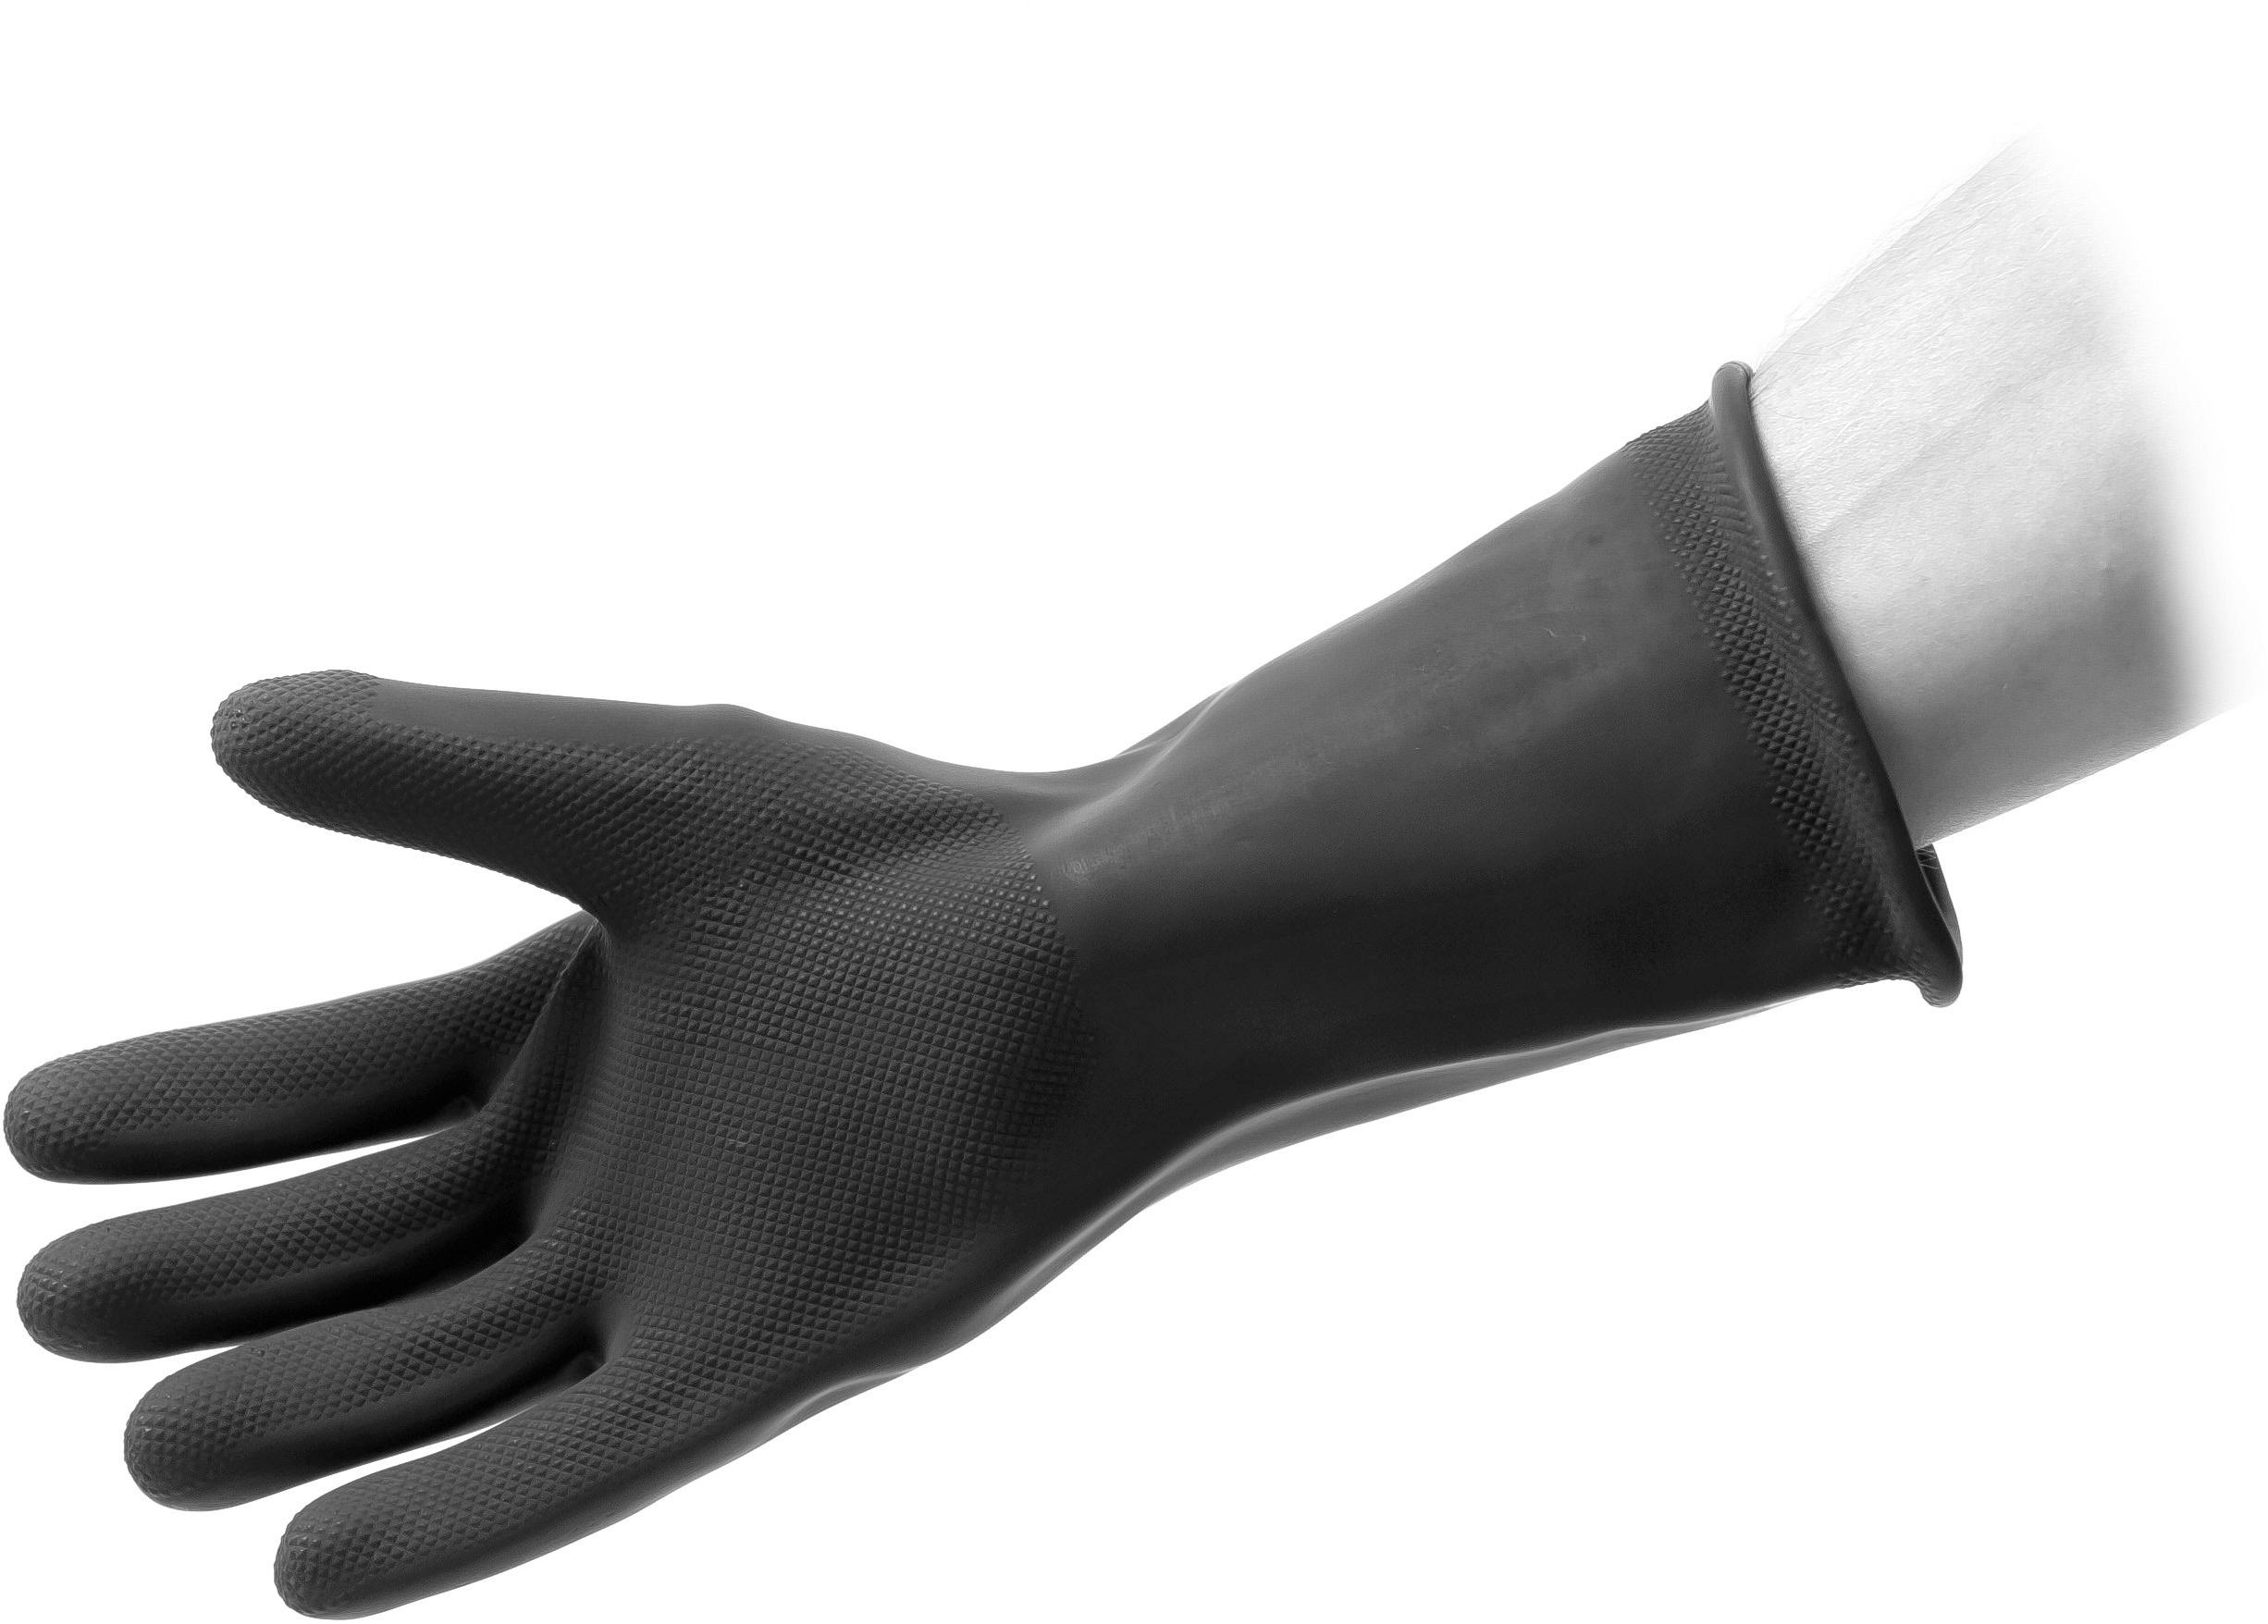 aqua lung handschuh preisvergleich. Black Bedroom Furniture Sets. Home Design Ideas